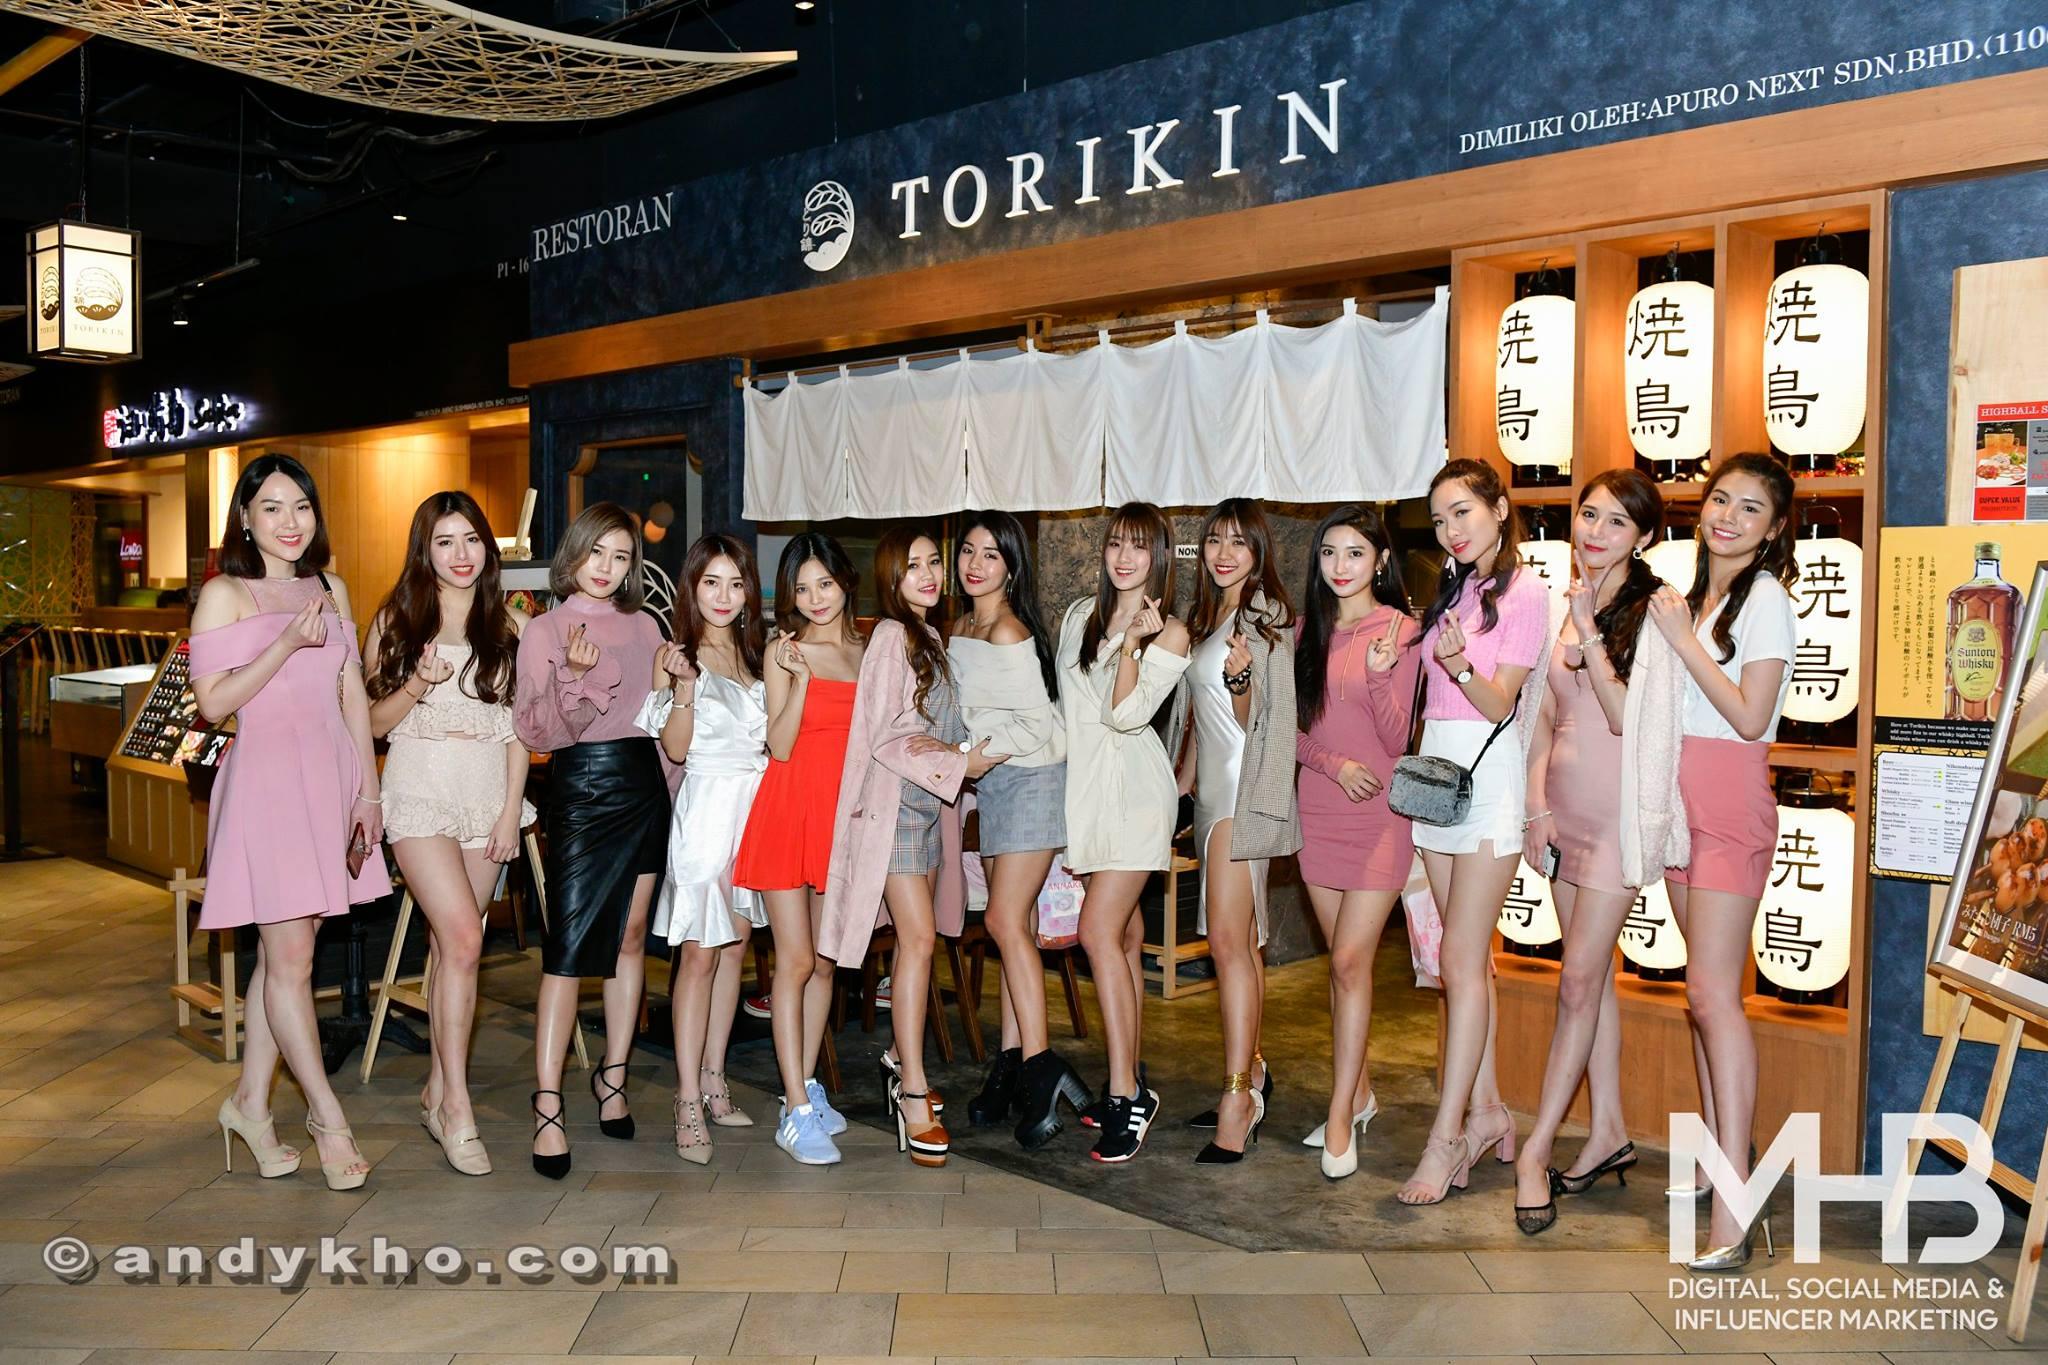 Canmake Tokyo x Torikin x MHB Digital Influencer Dinner